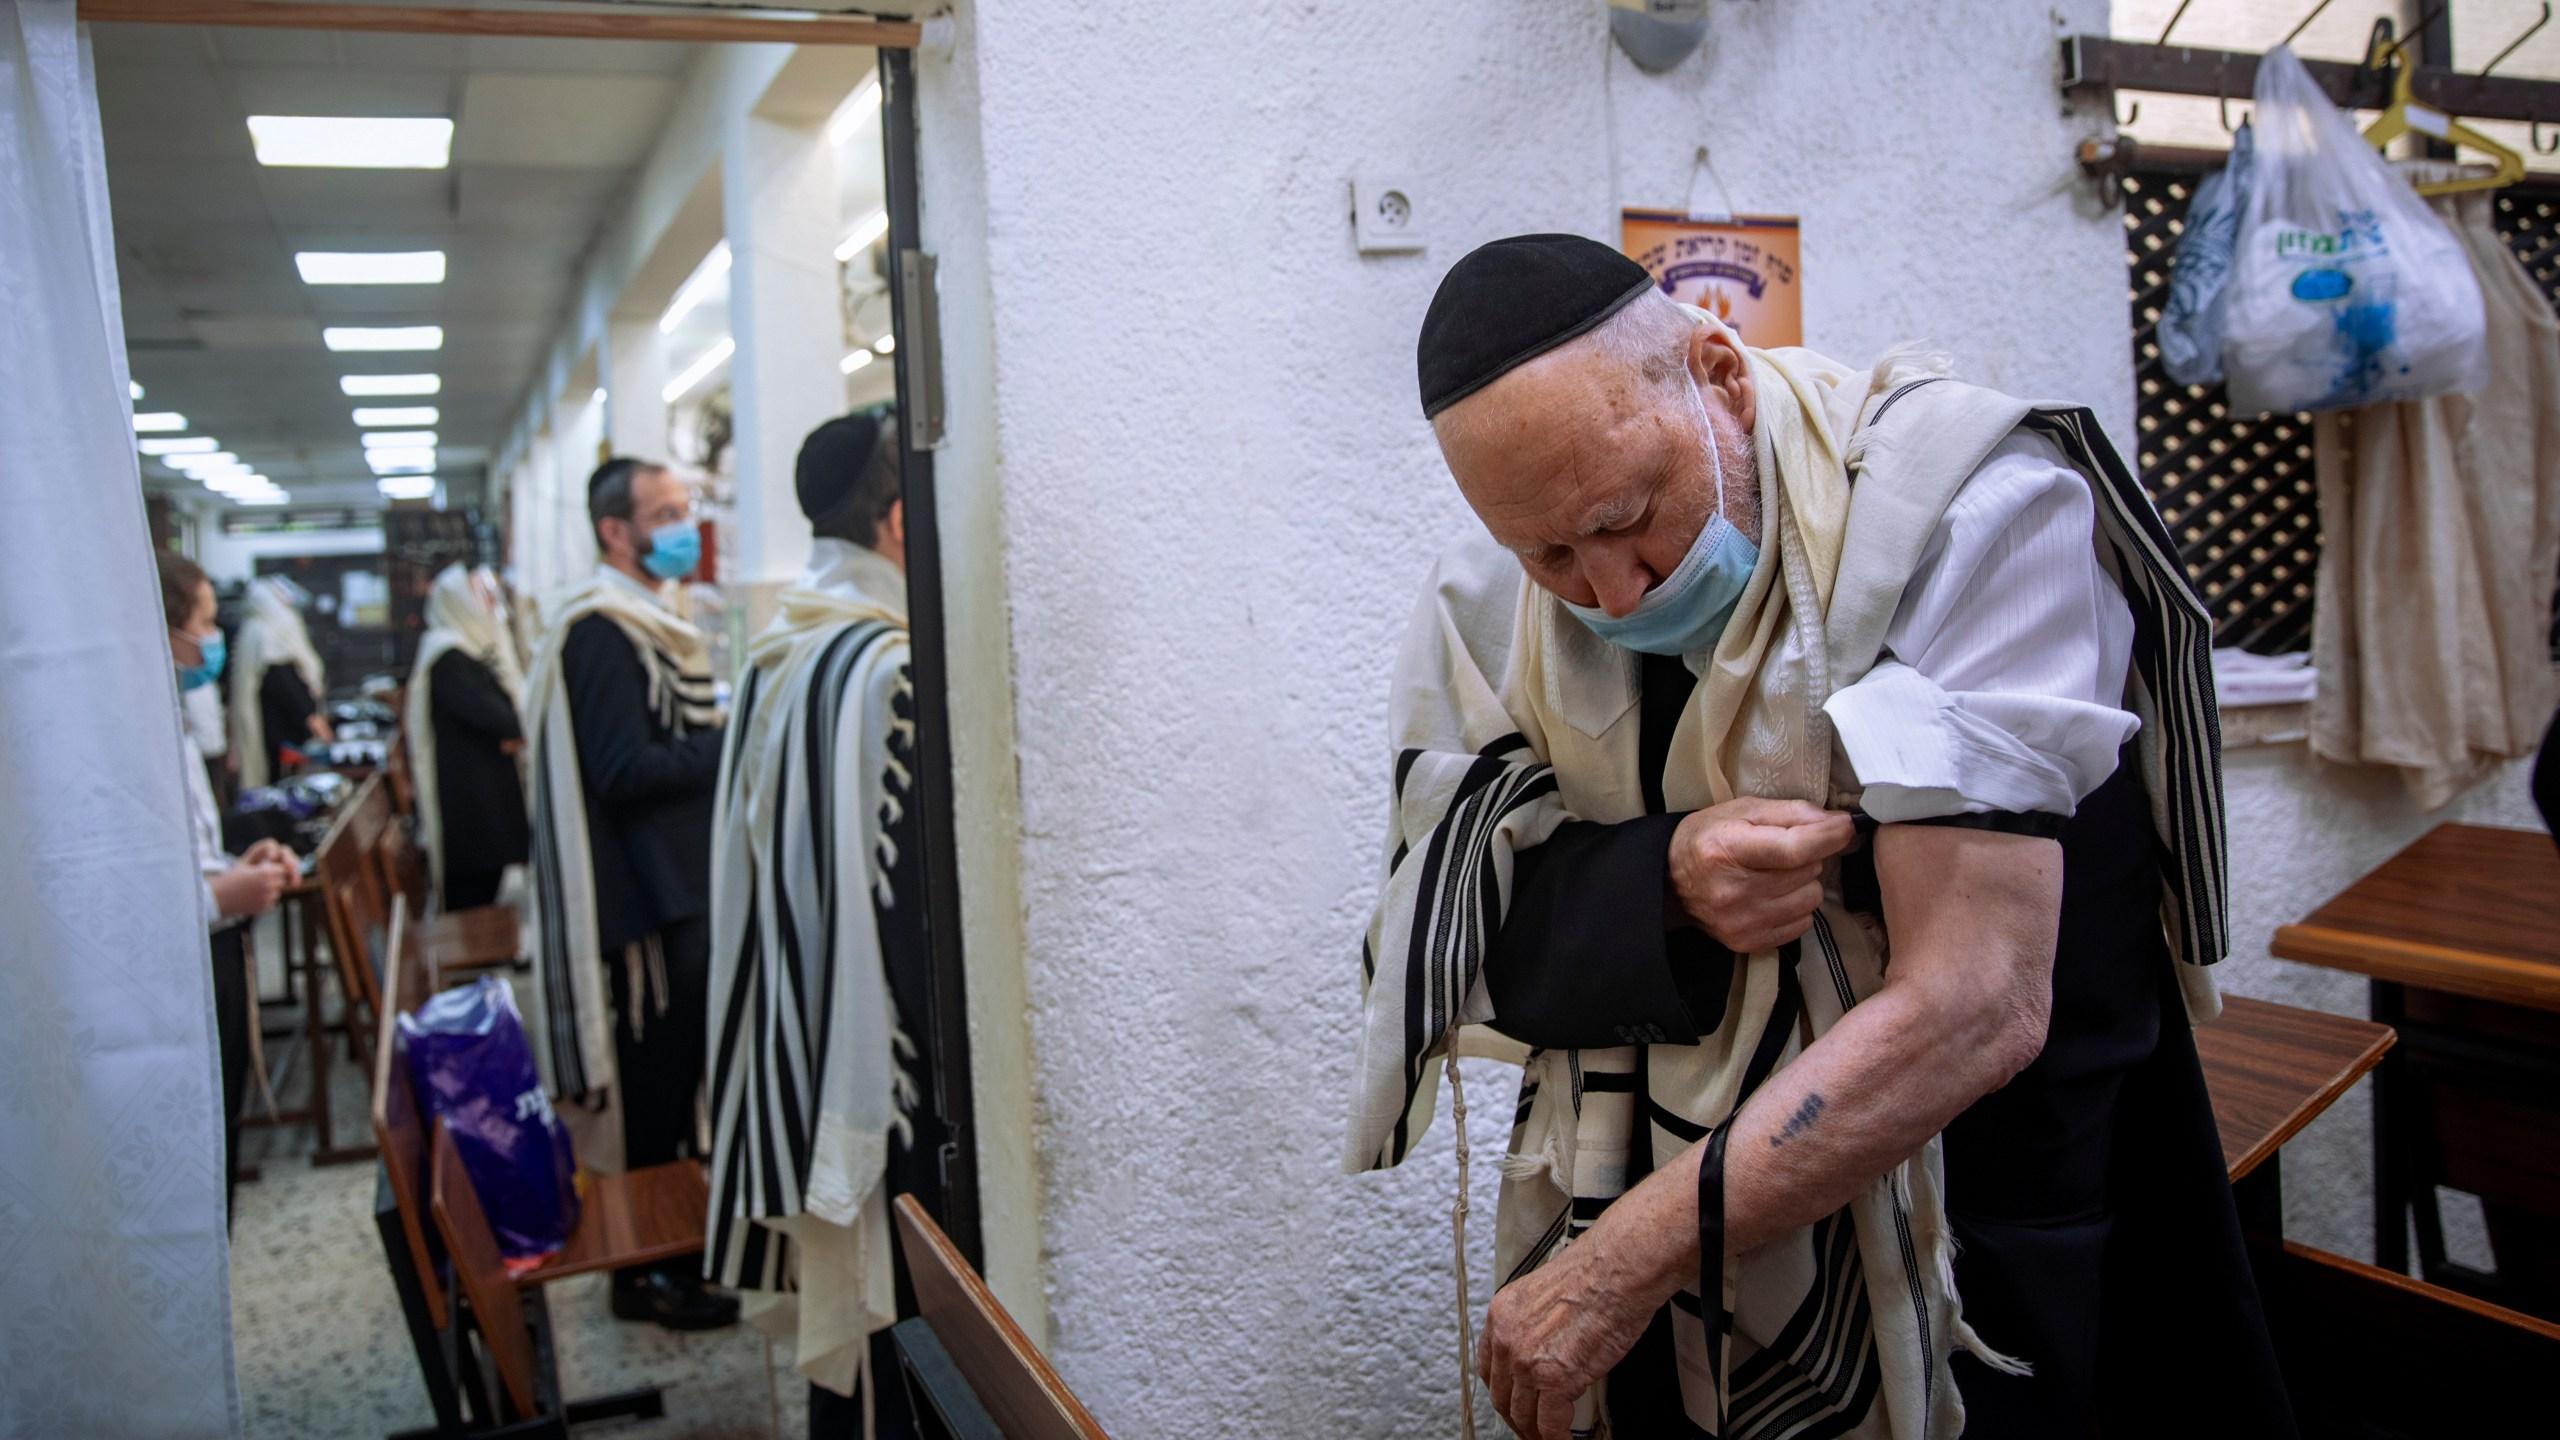 Yehoshua Datsinger